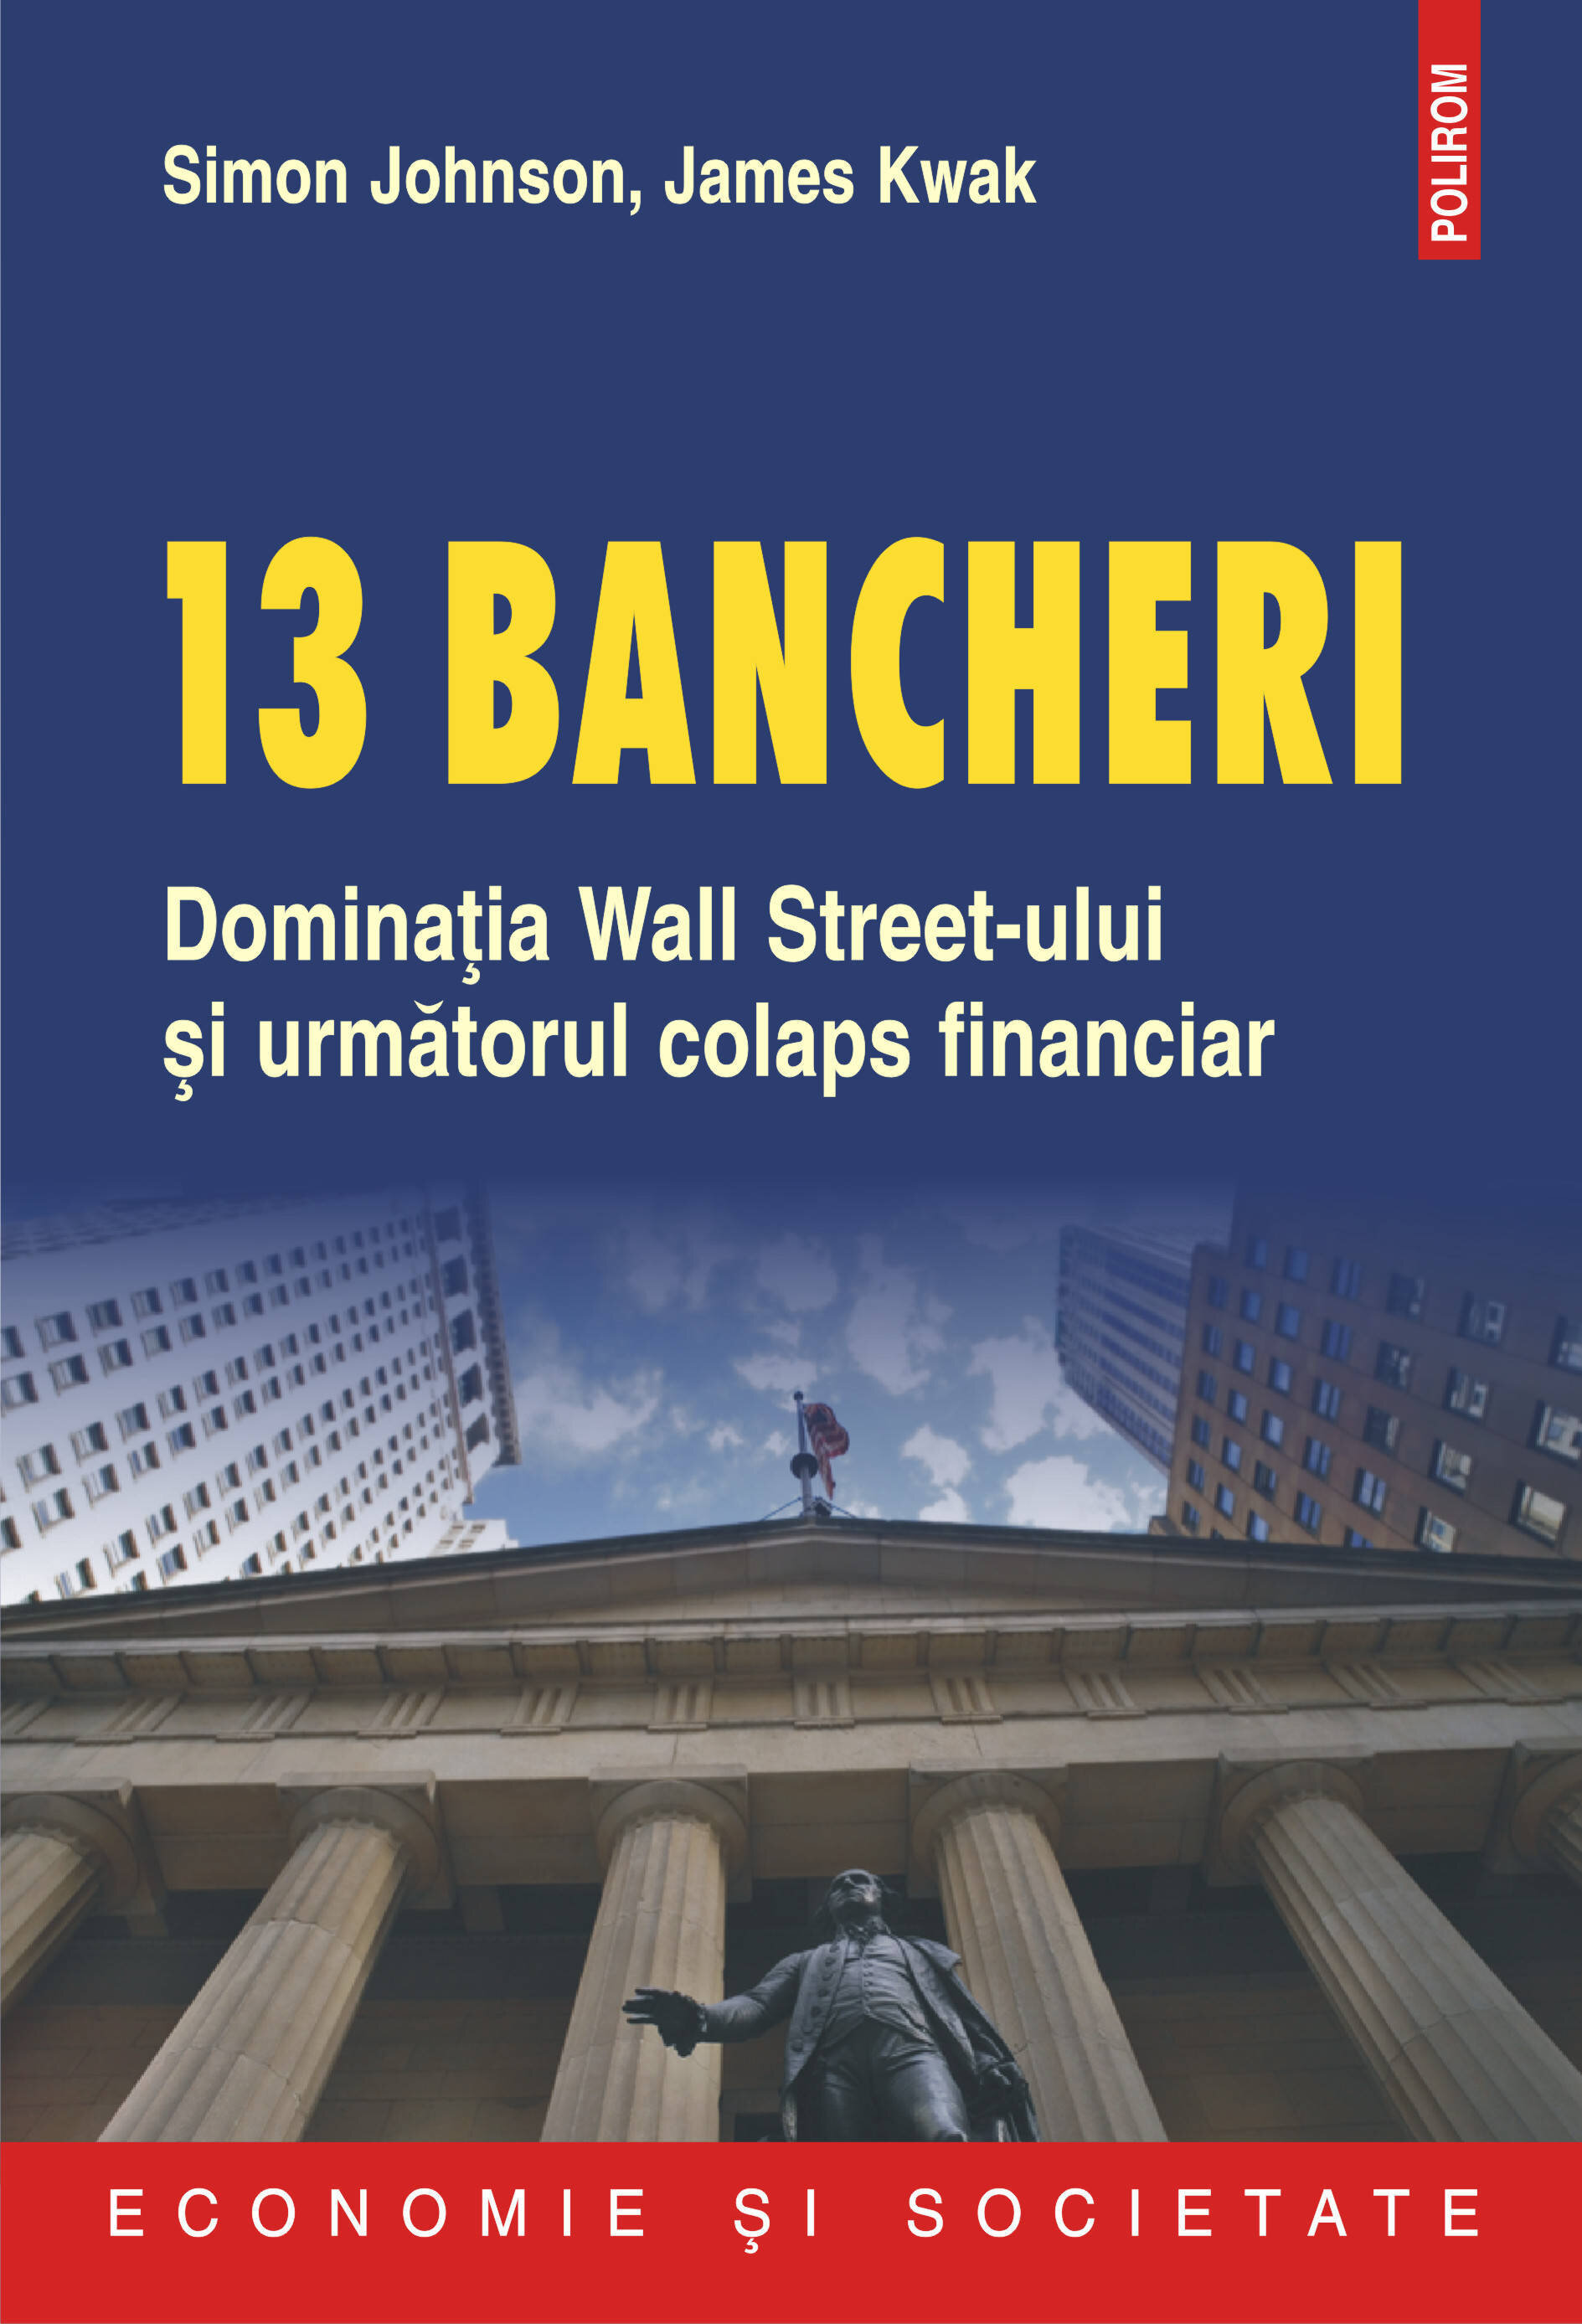 13 bancheri. Dominatia Wall Streeet-ului si urmatorul colaps financiar (eBook)